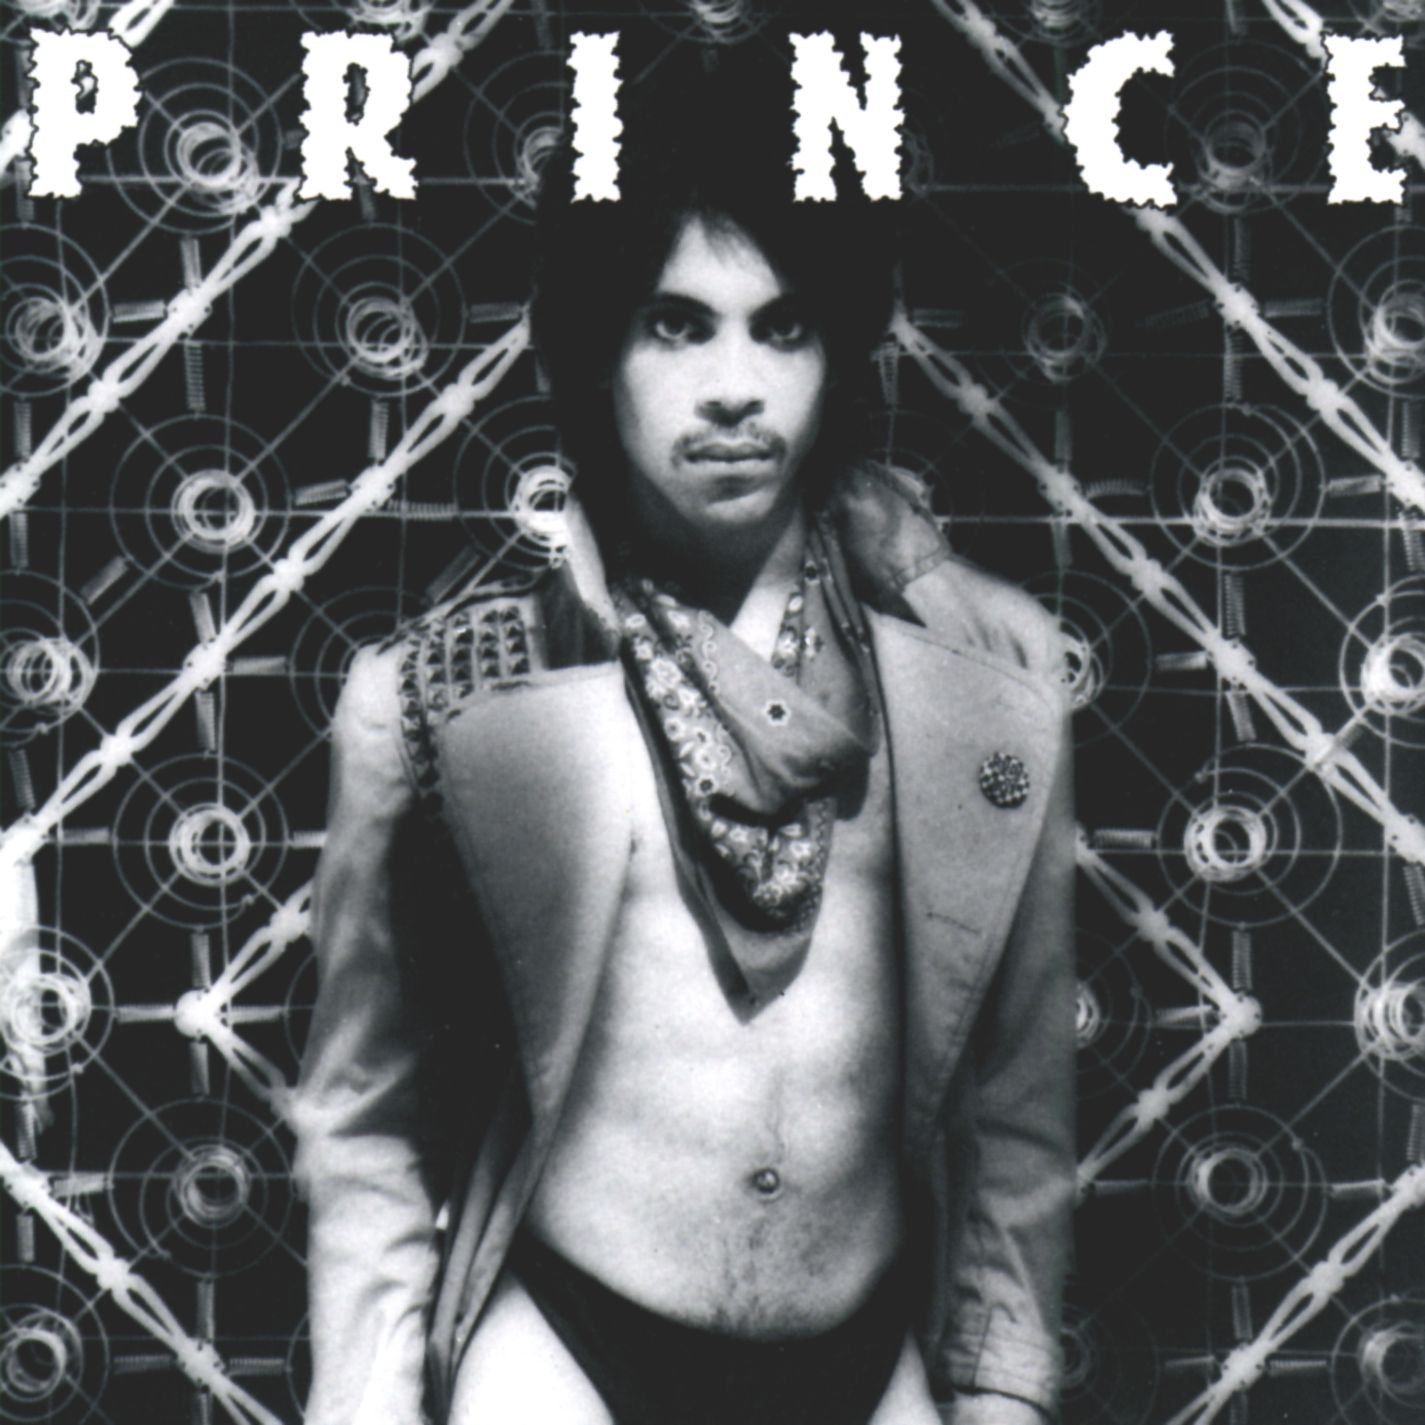 Prince free album giveaways